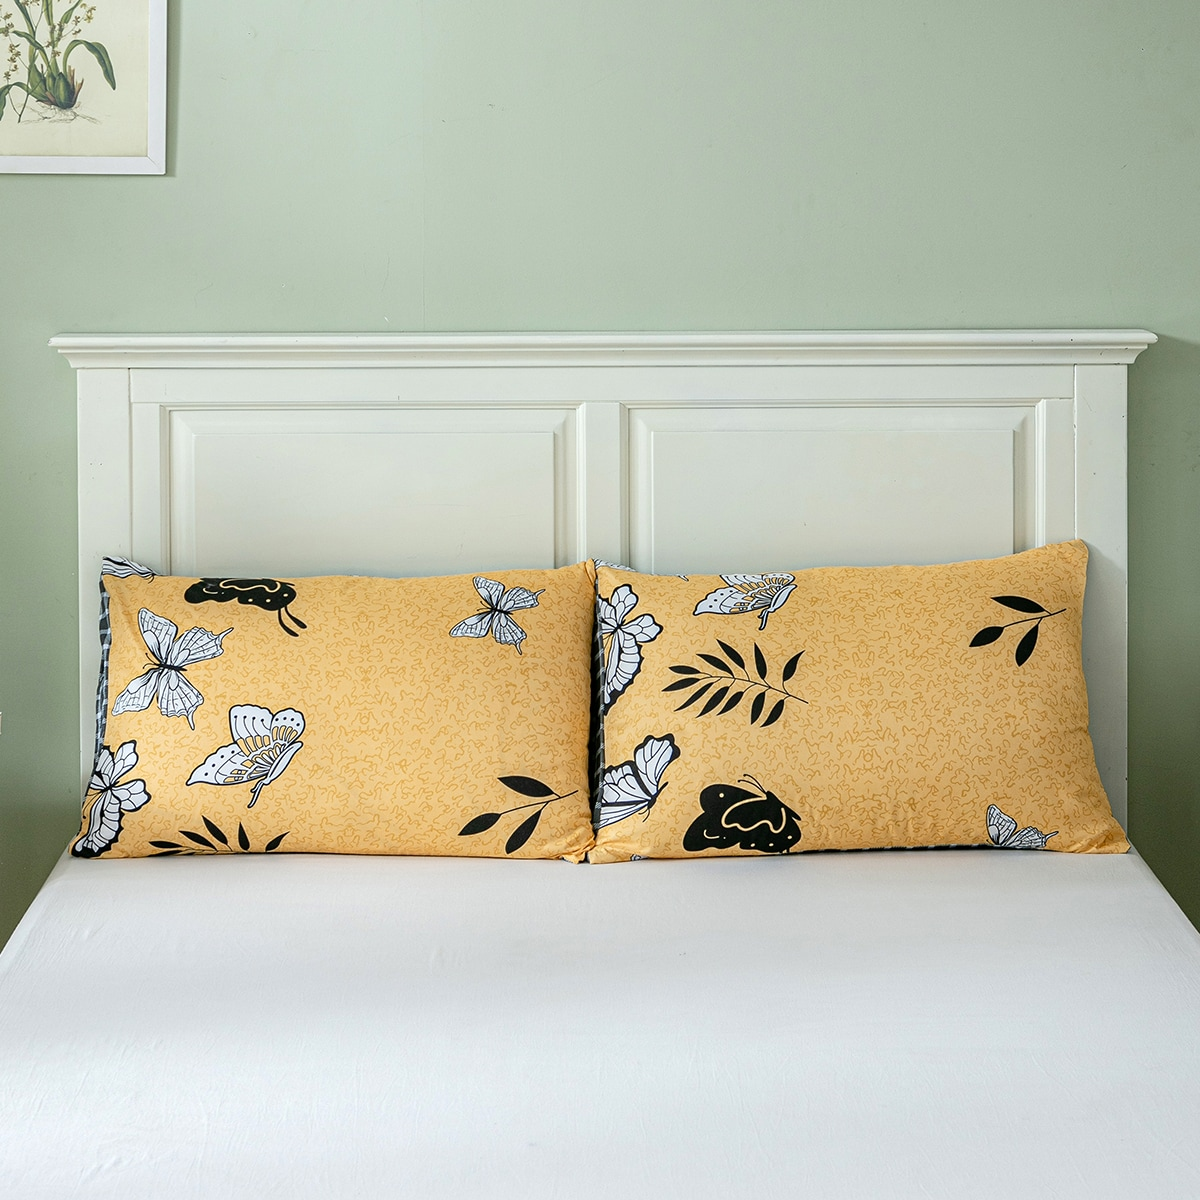 1Pair Flower Print Pillowcase Without Filler